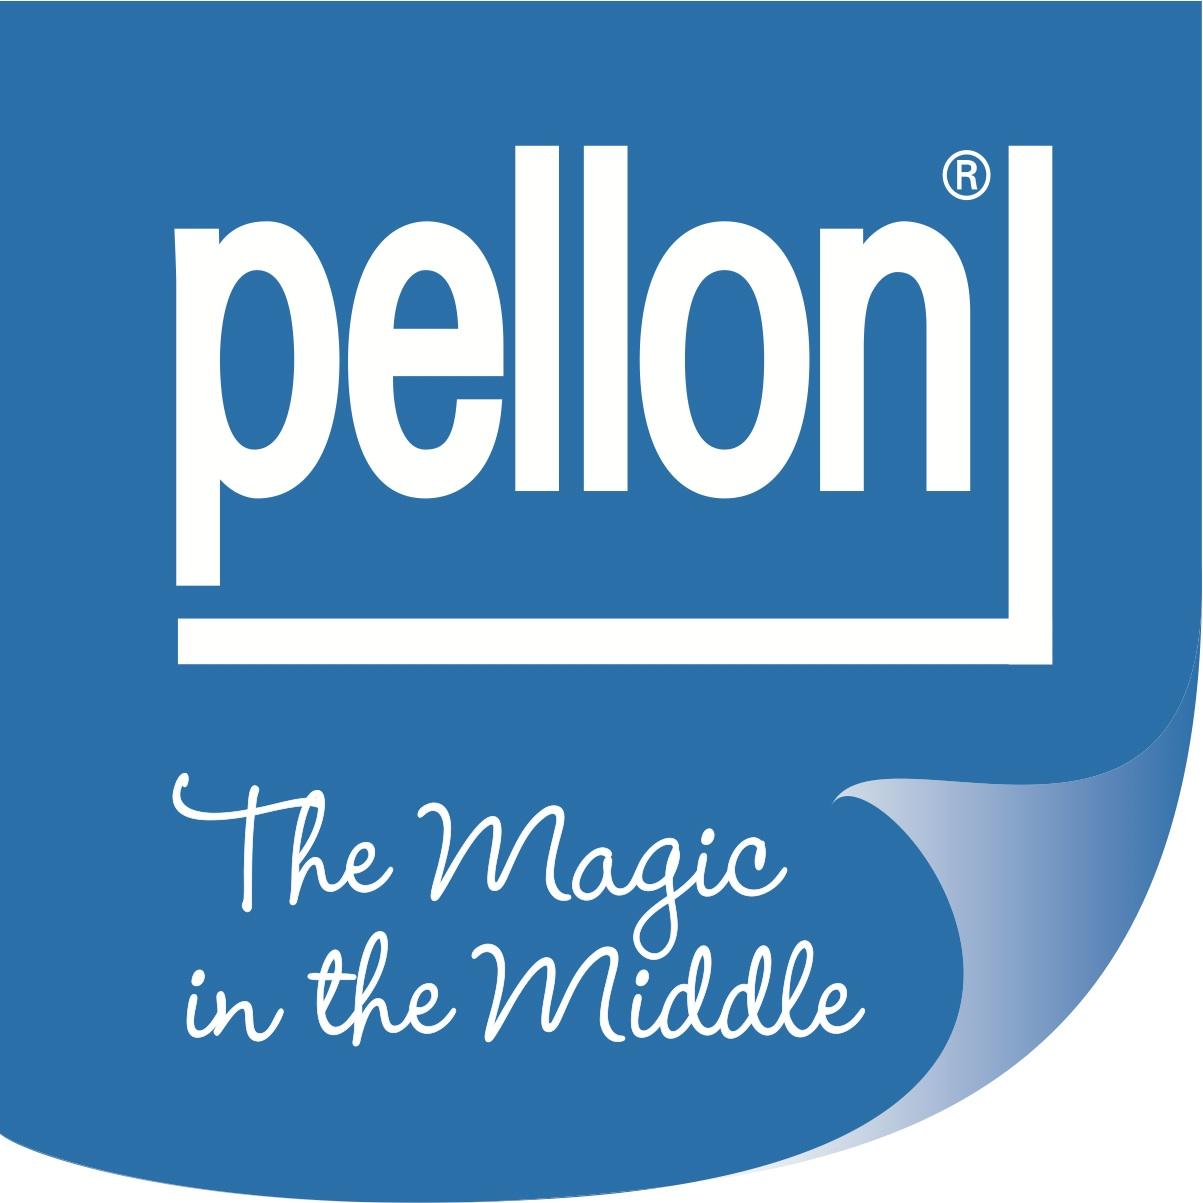 14 Oct Pellon at Sewtopia Salt Lake